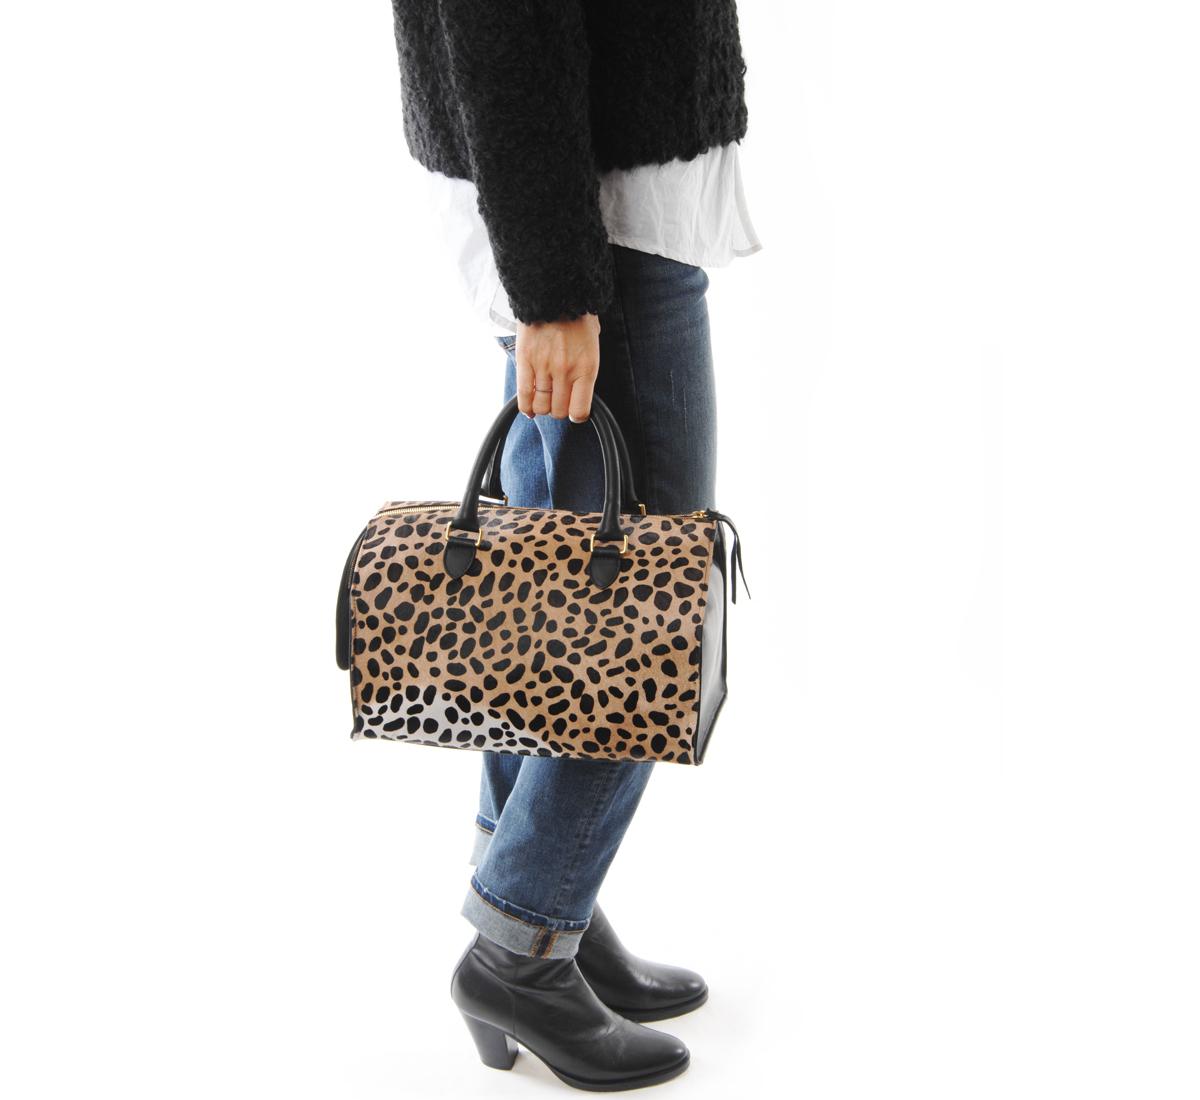 f03ad6f659a2 Clare V. Petit Alistair Handbag - Poppy. $368.00. A. Cheng · Paloma Wool  Morgui Crochet Bucket Bag. $87.00. Prism